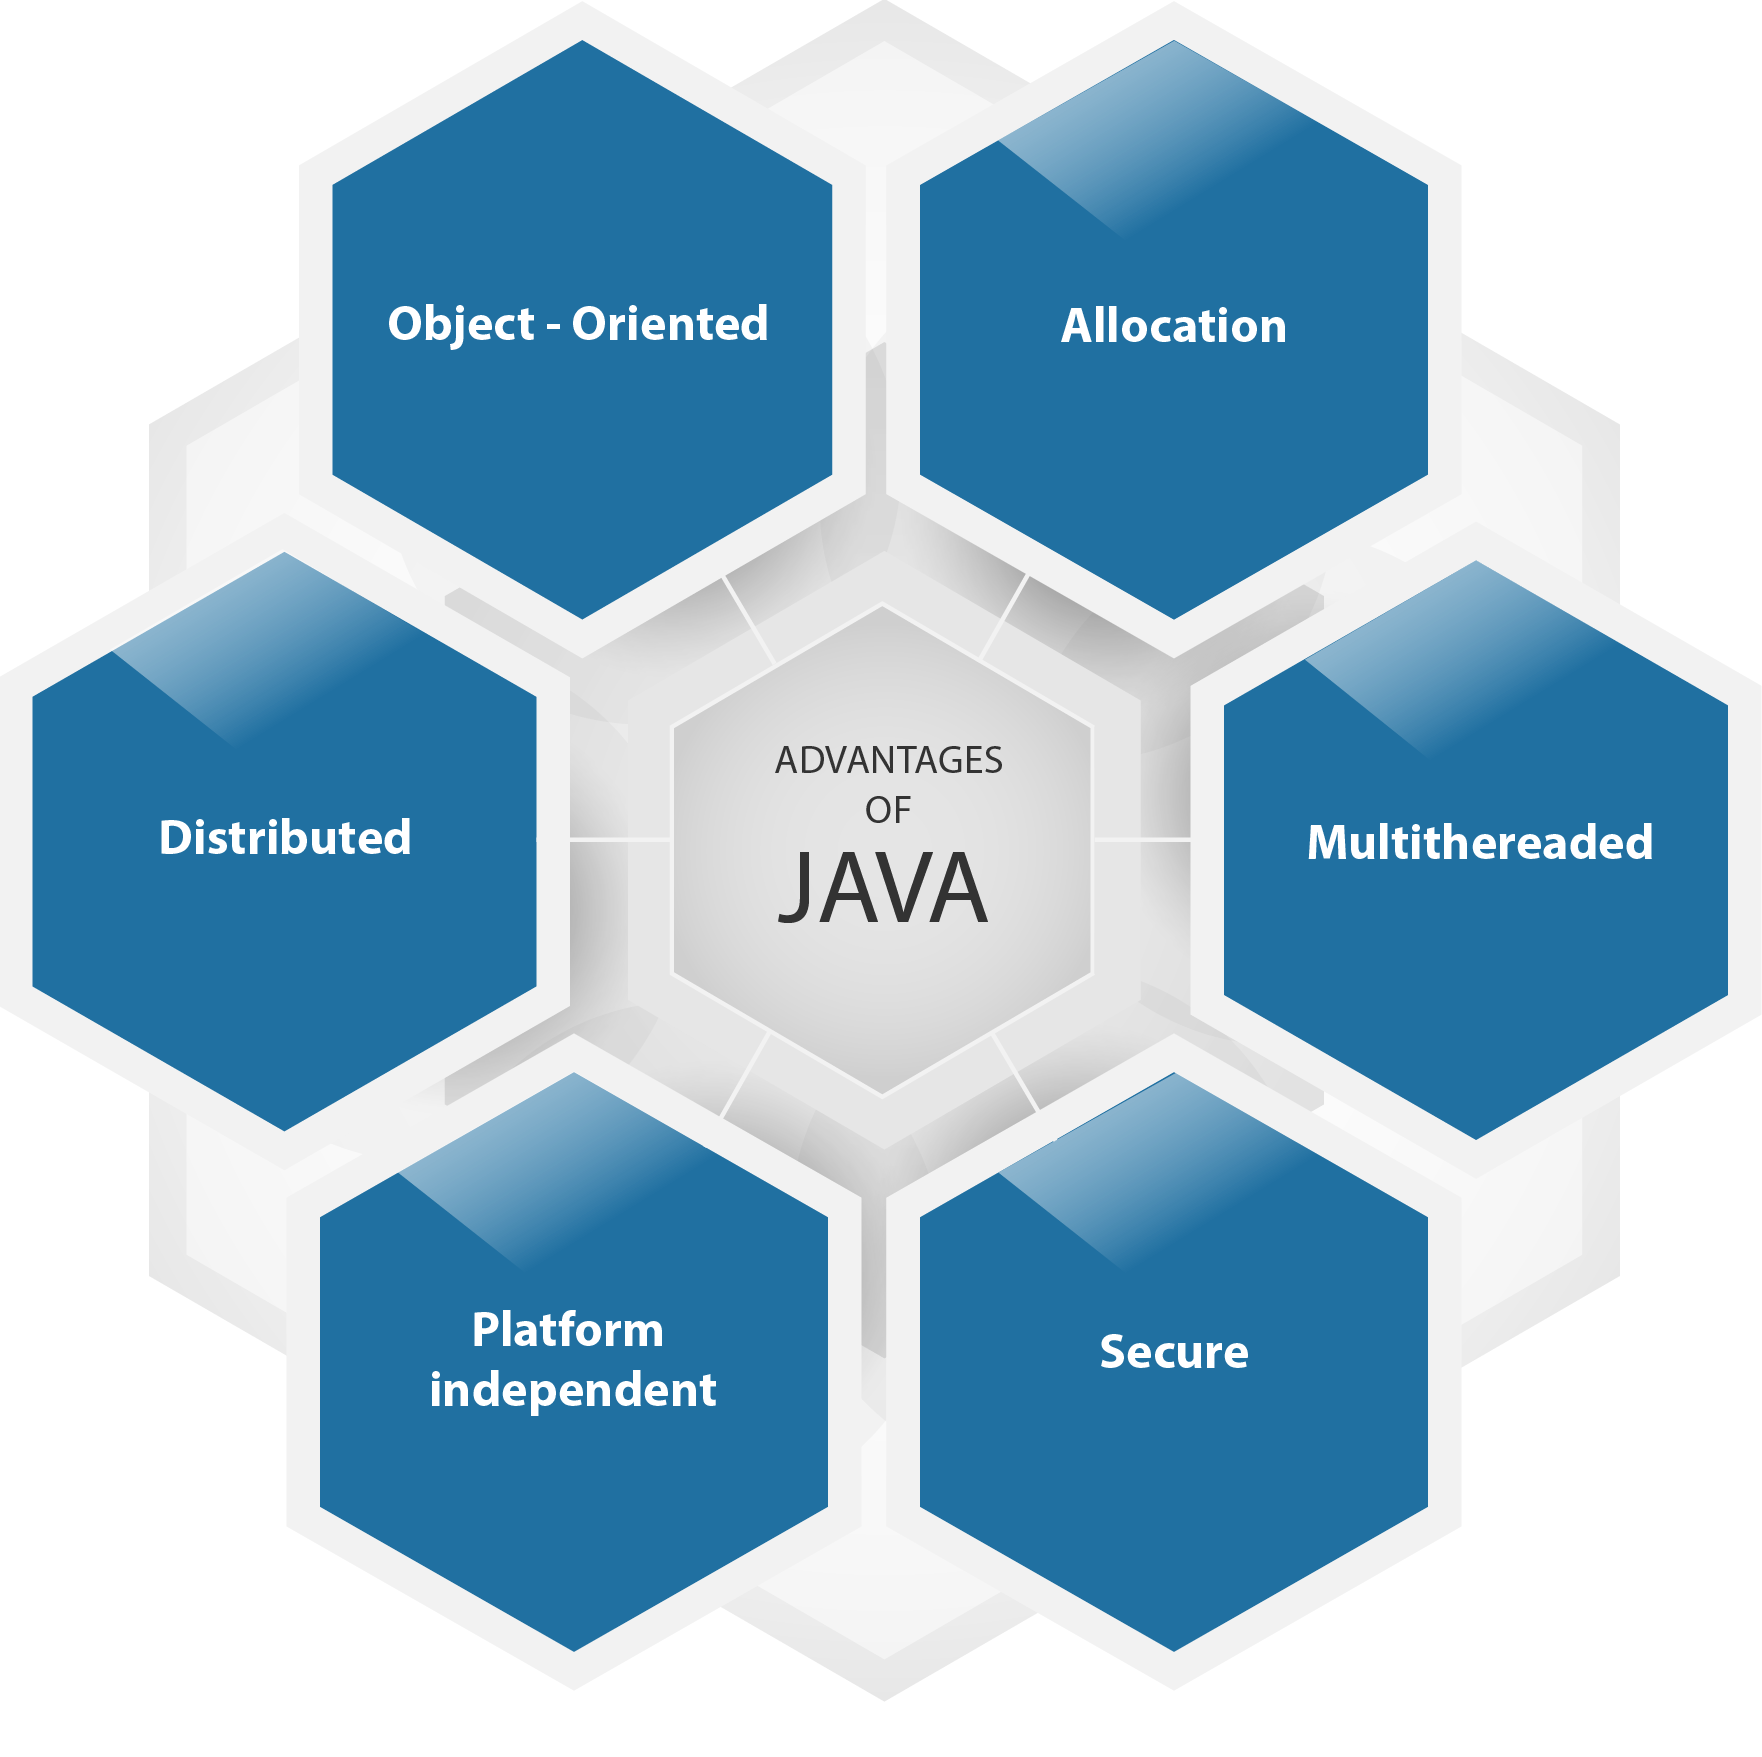 Java Enterprise application, Web design trends, Object